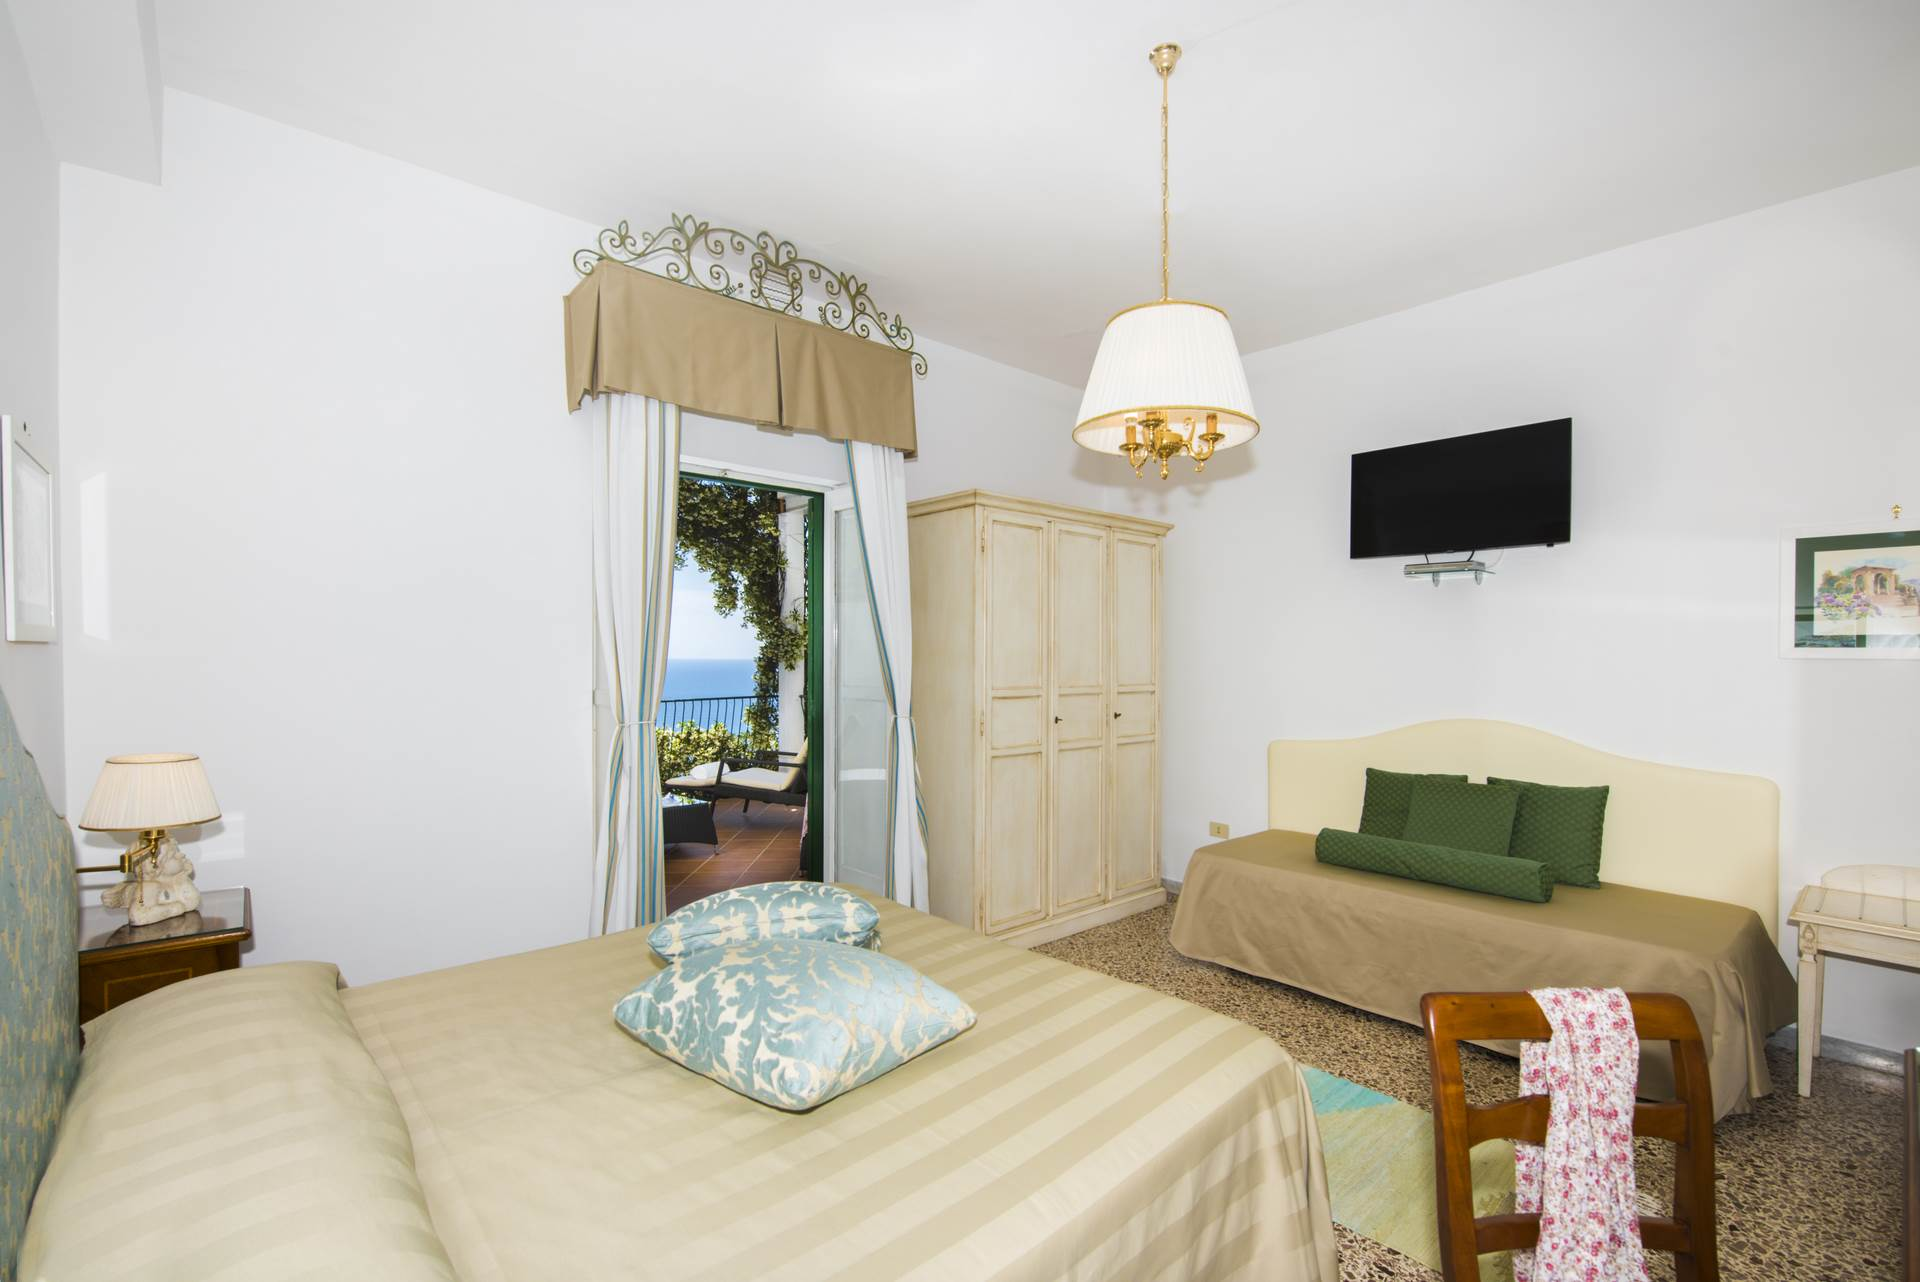 hotel_pellegrino_praiano_35_1920